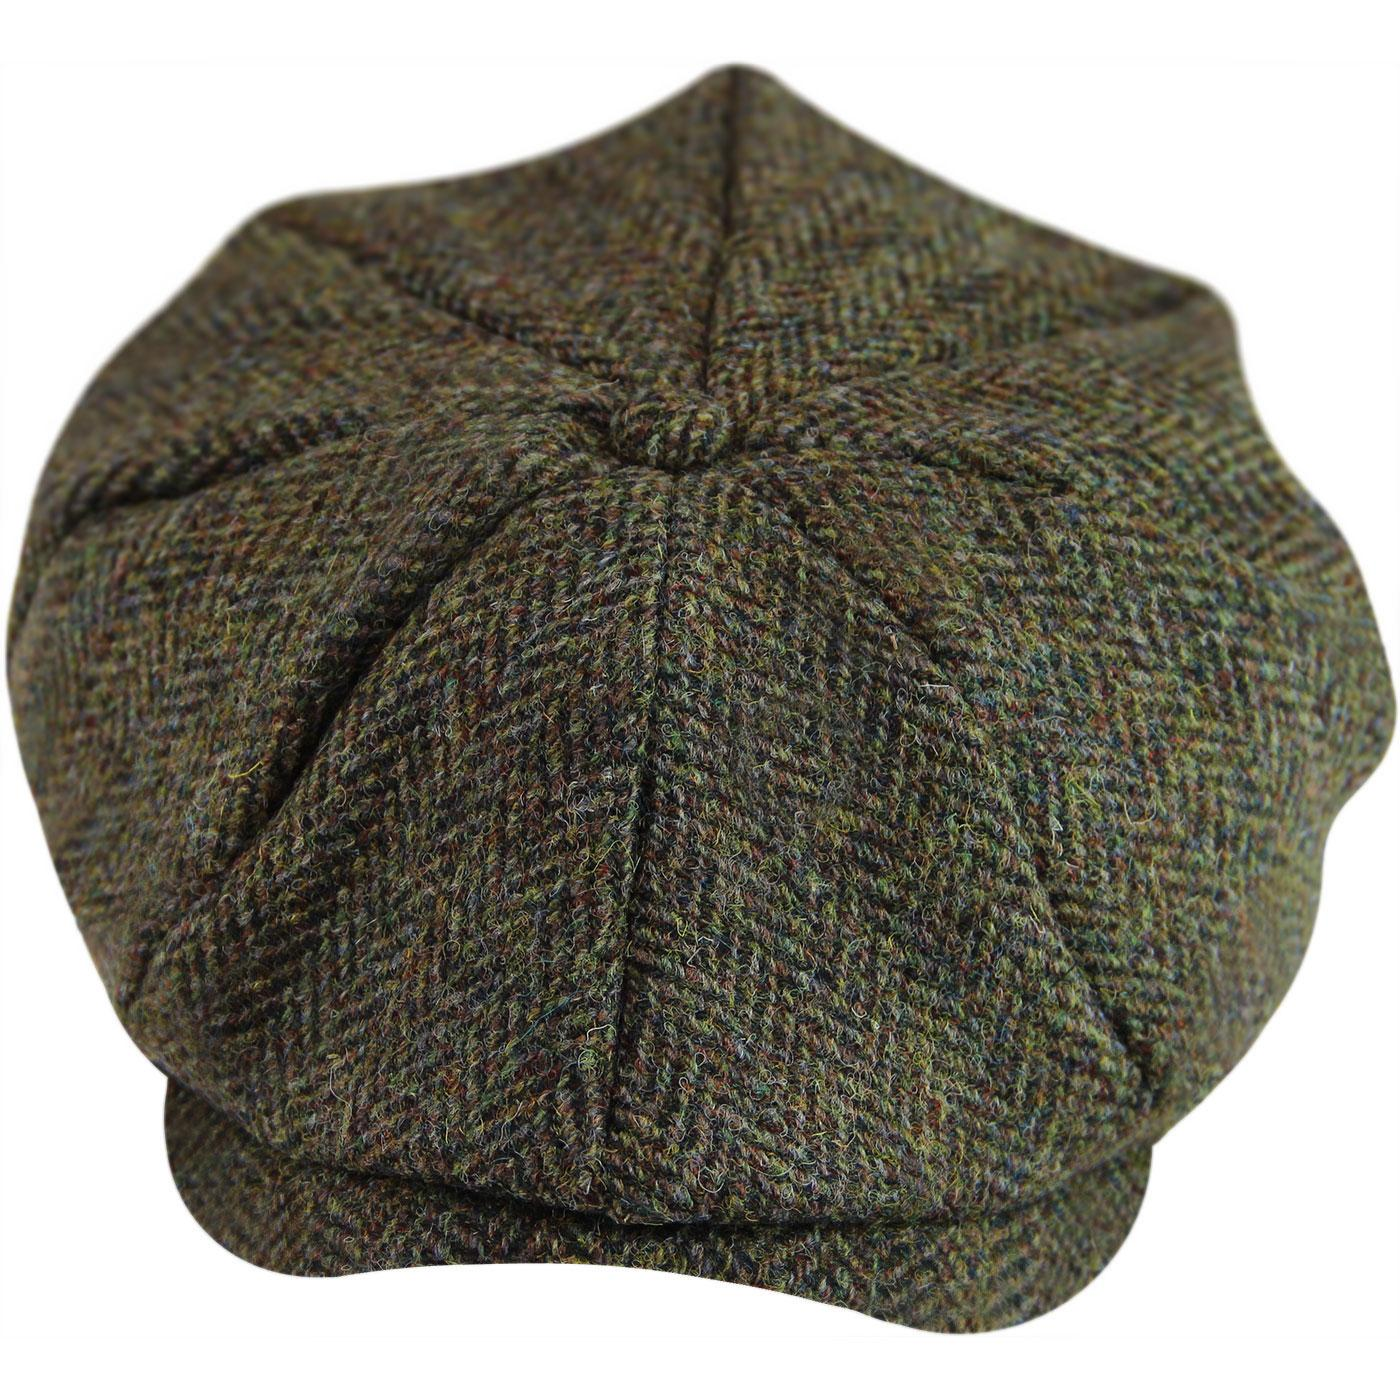 GIBSON LONDON Retro Herringbone Tweed Gatsby Hat G